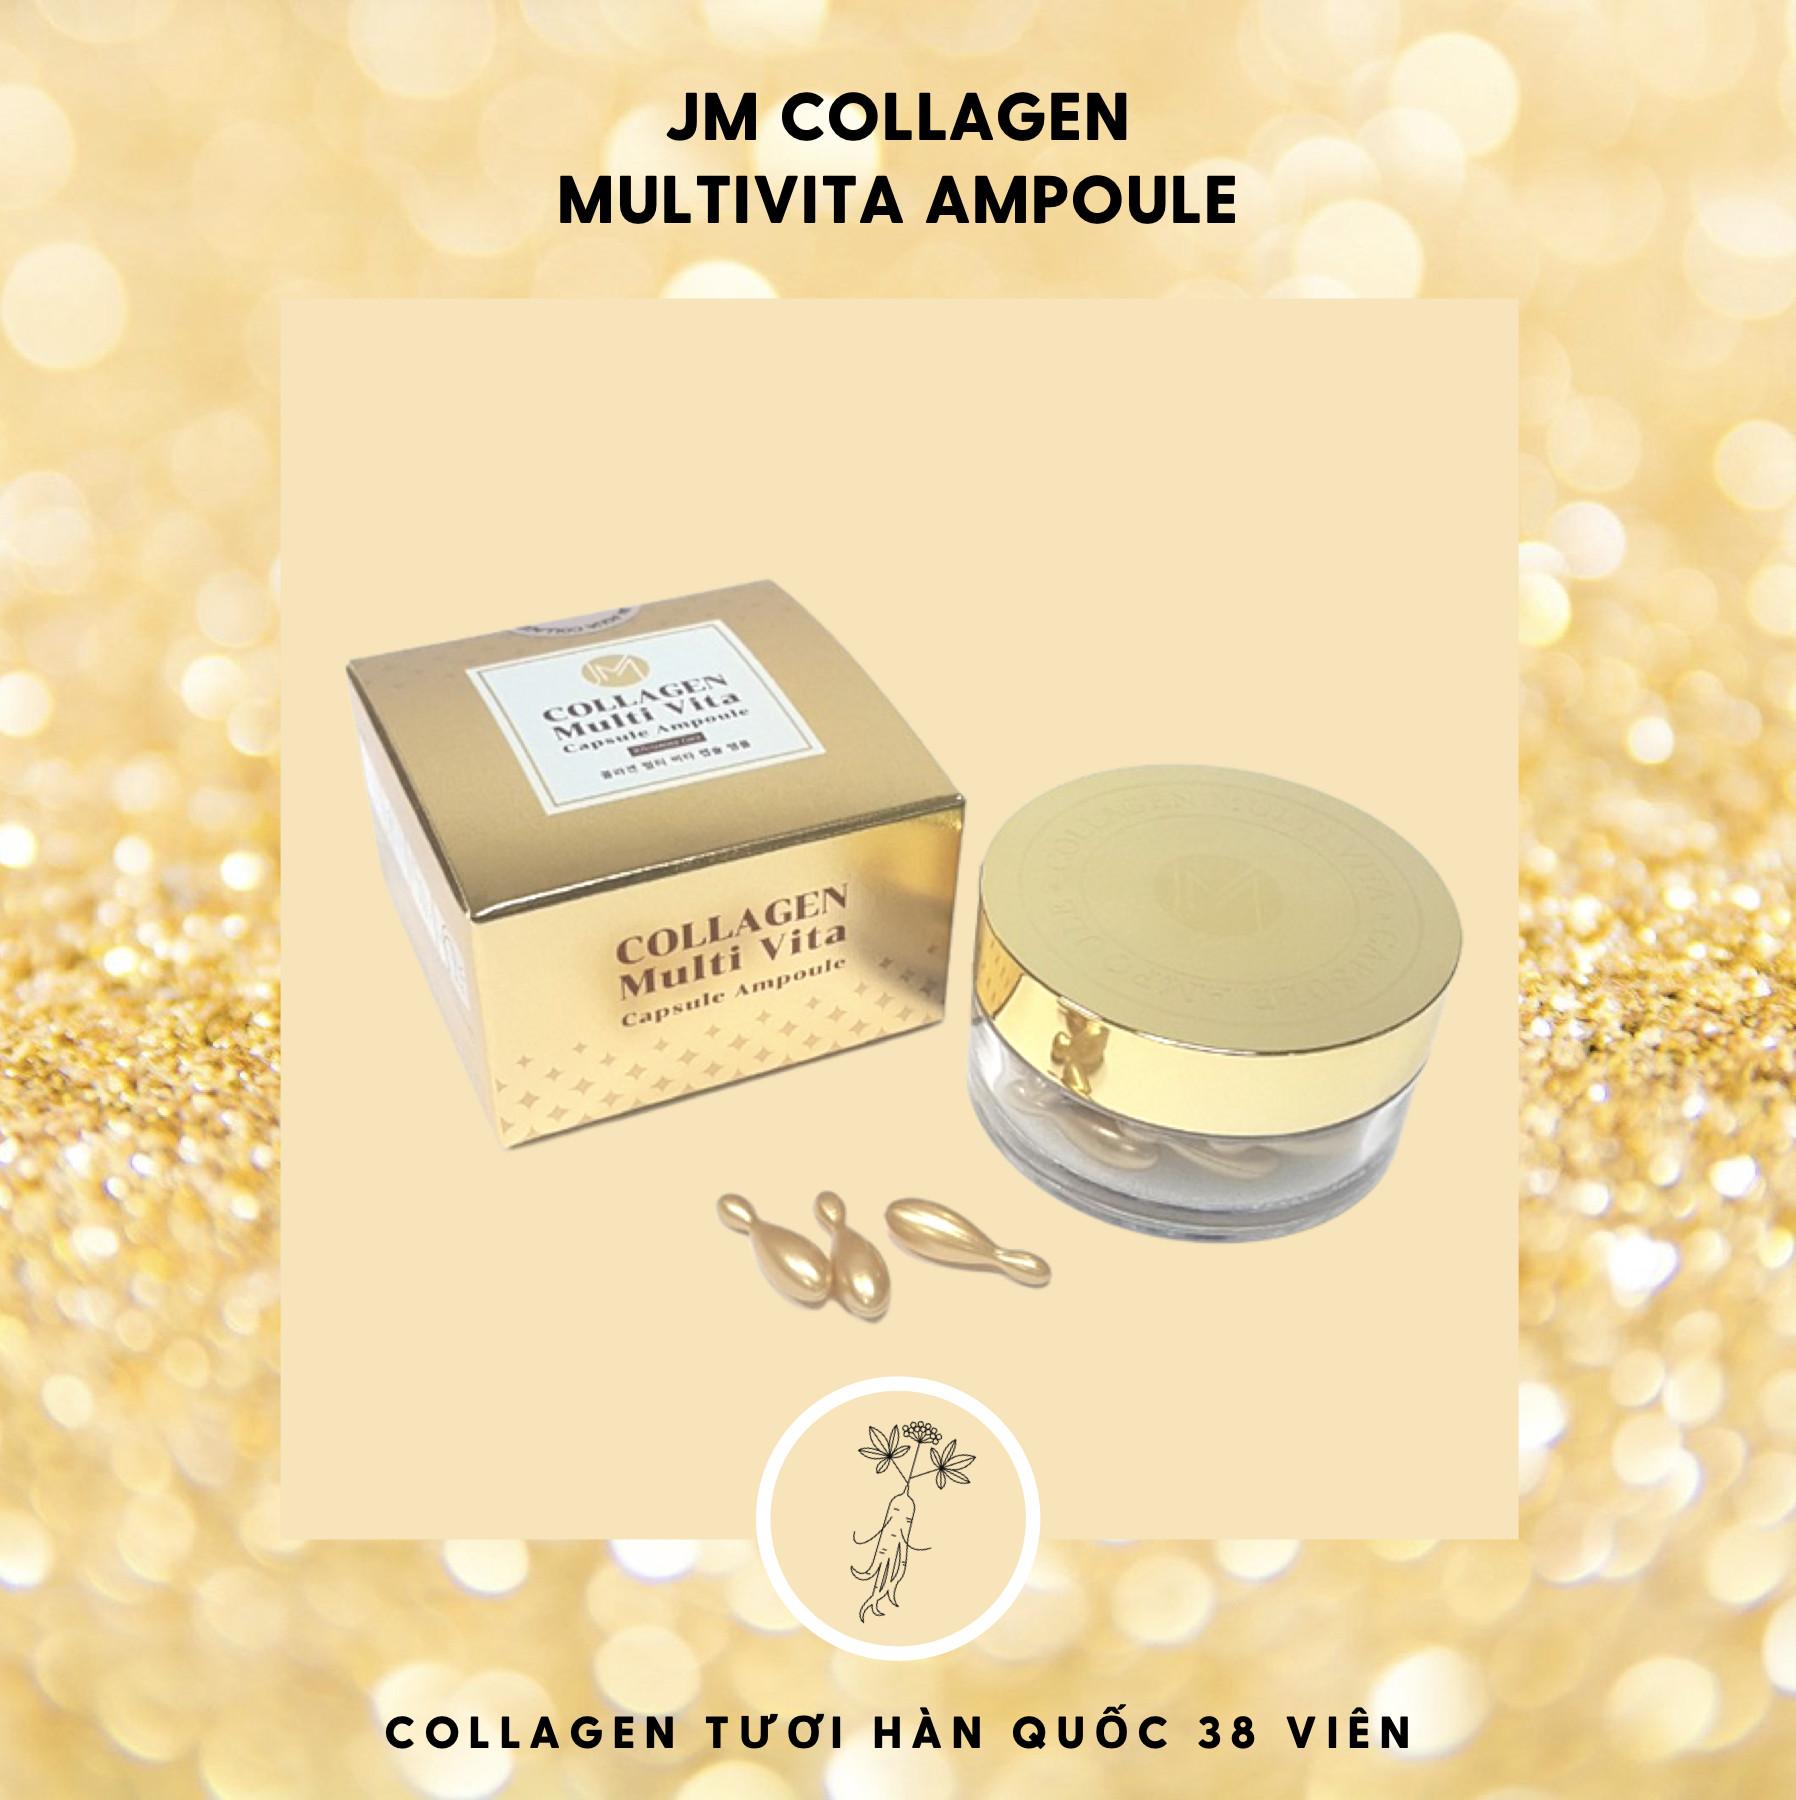 Sản phẩm JM Collagen Multivita Ampoule.